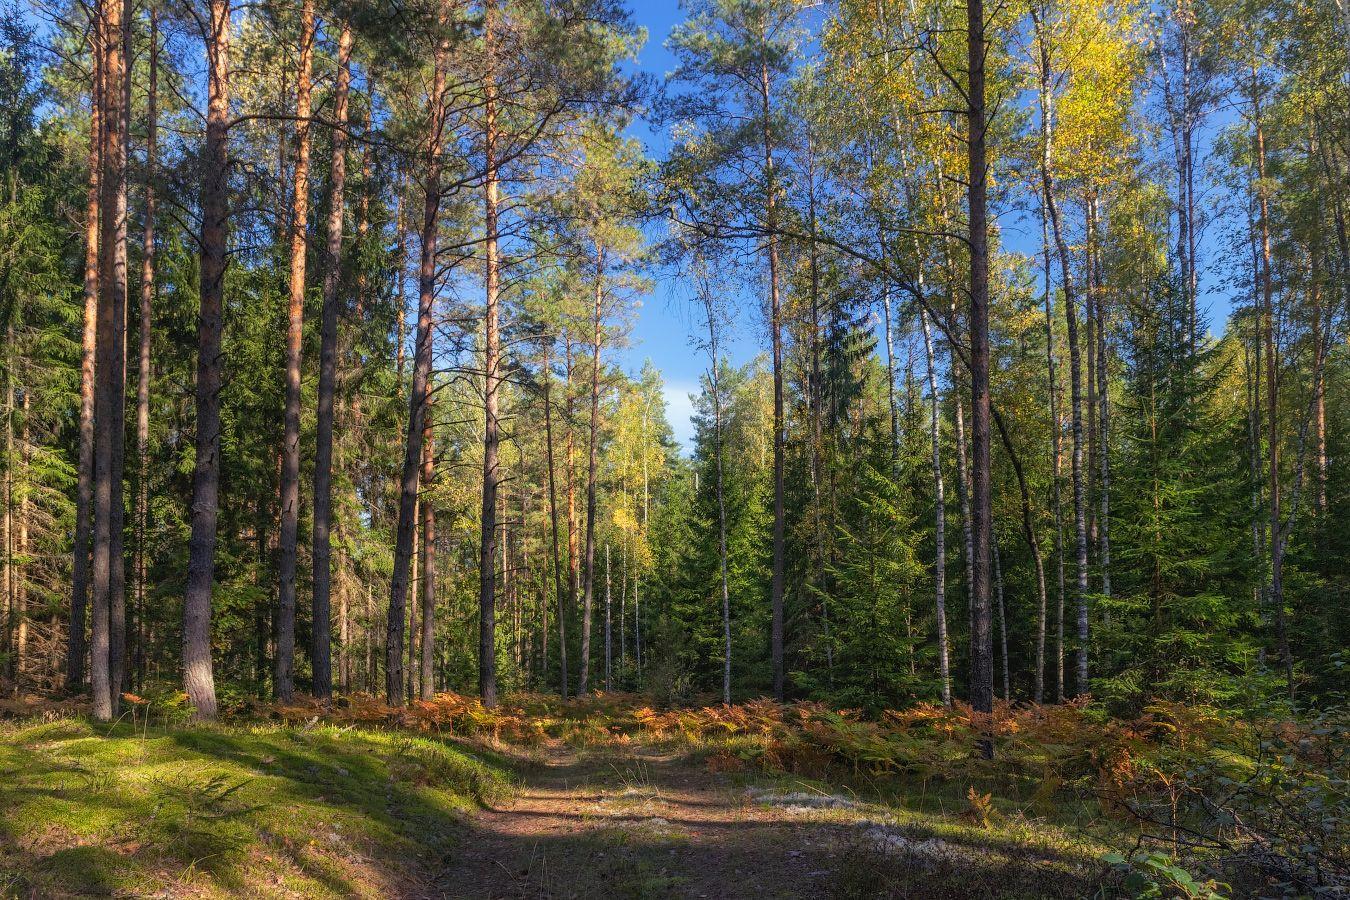 осень, лес, дорога, небо,, Сергей Шабуневич